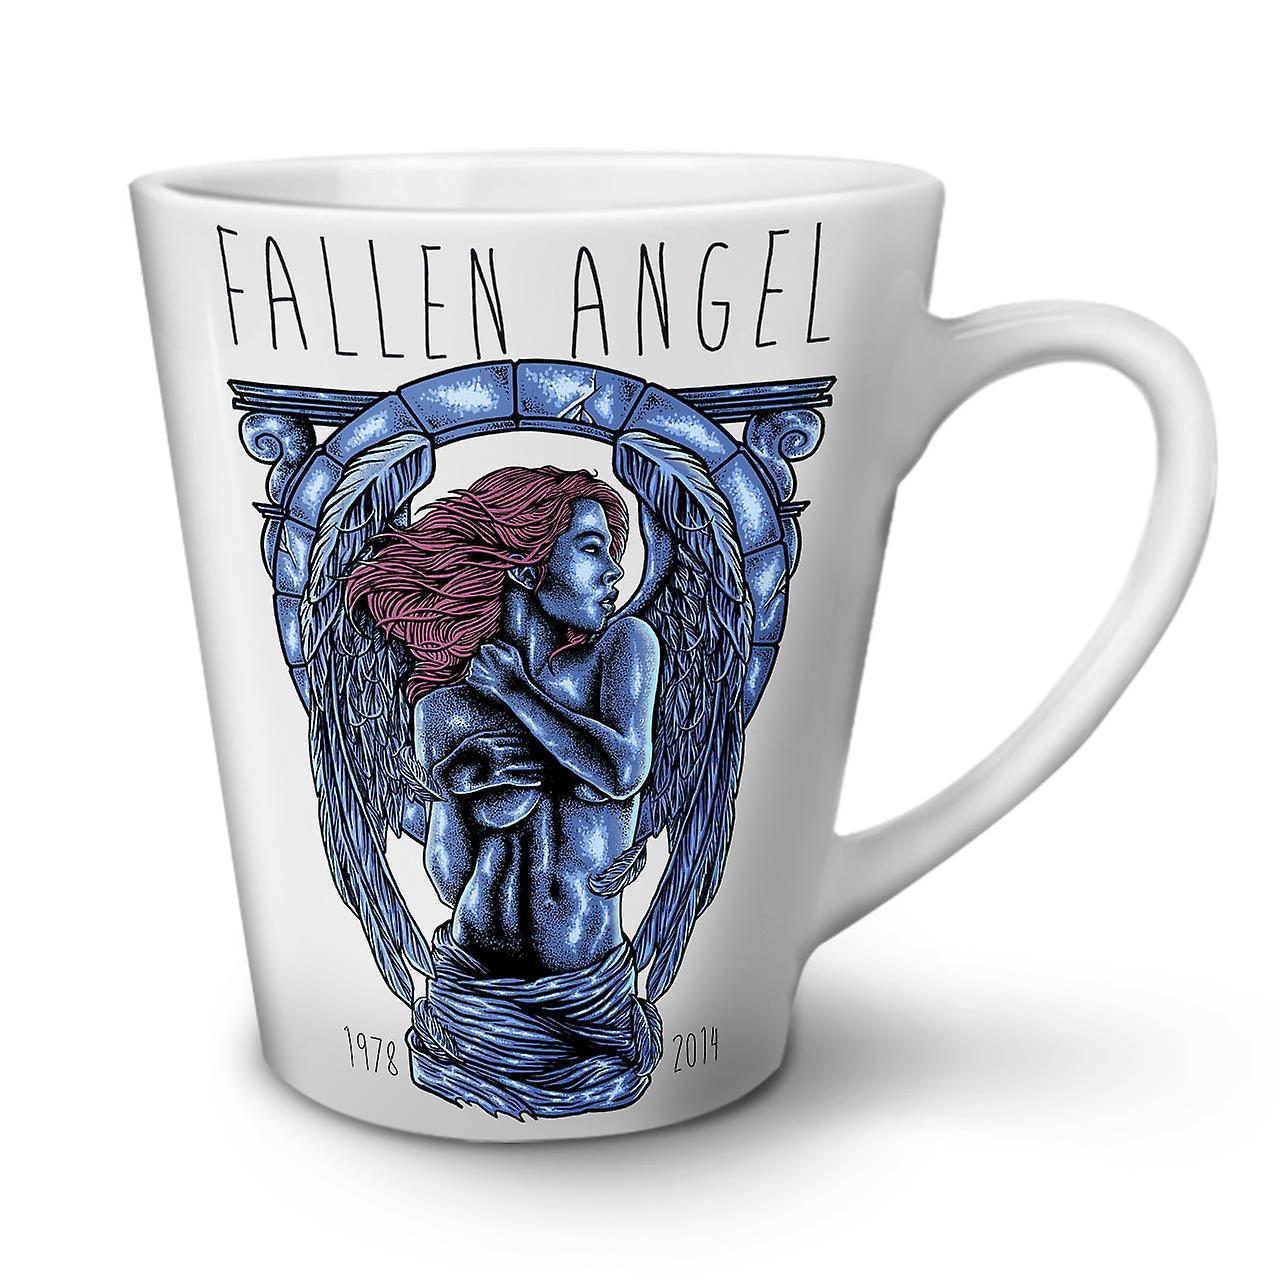 Angel Mug Céramique En Fallen OzWellcoda Nouveau Mode Café Thé 12 Art Latte Blanc OkiXPuTZ